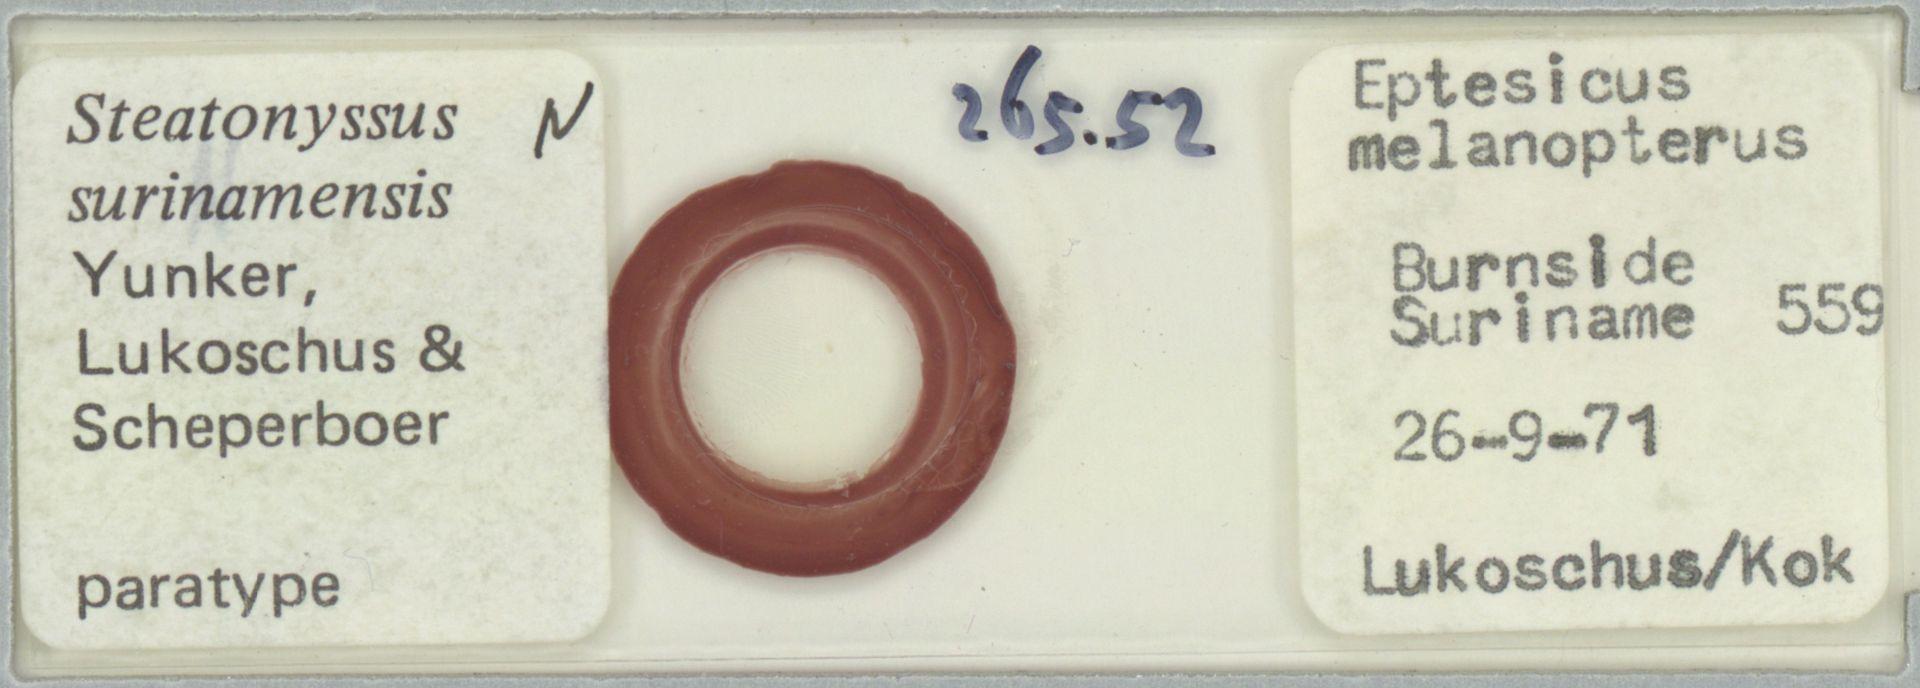 RMNH.ACA.P.12525 | Steatonyssus surinamensis